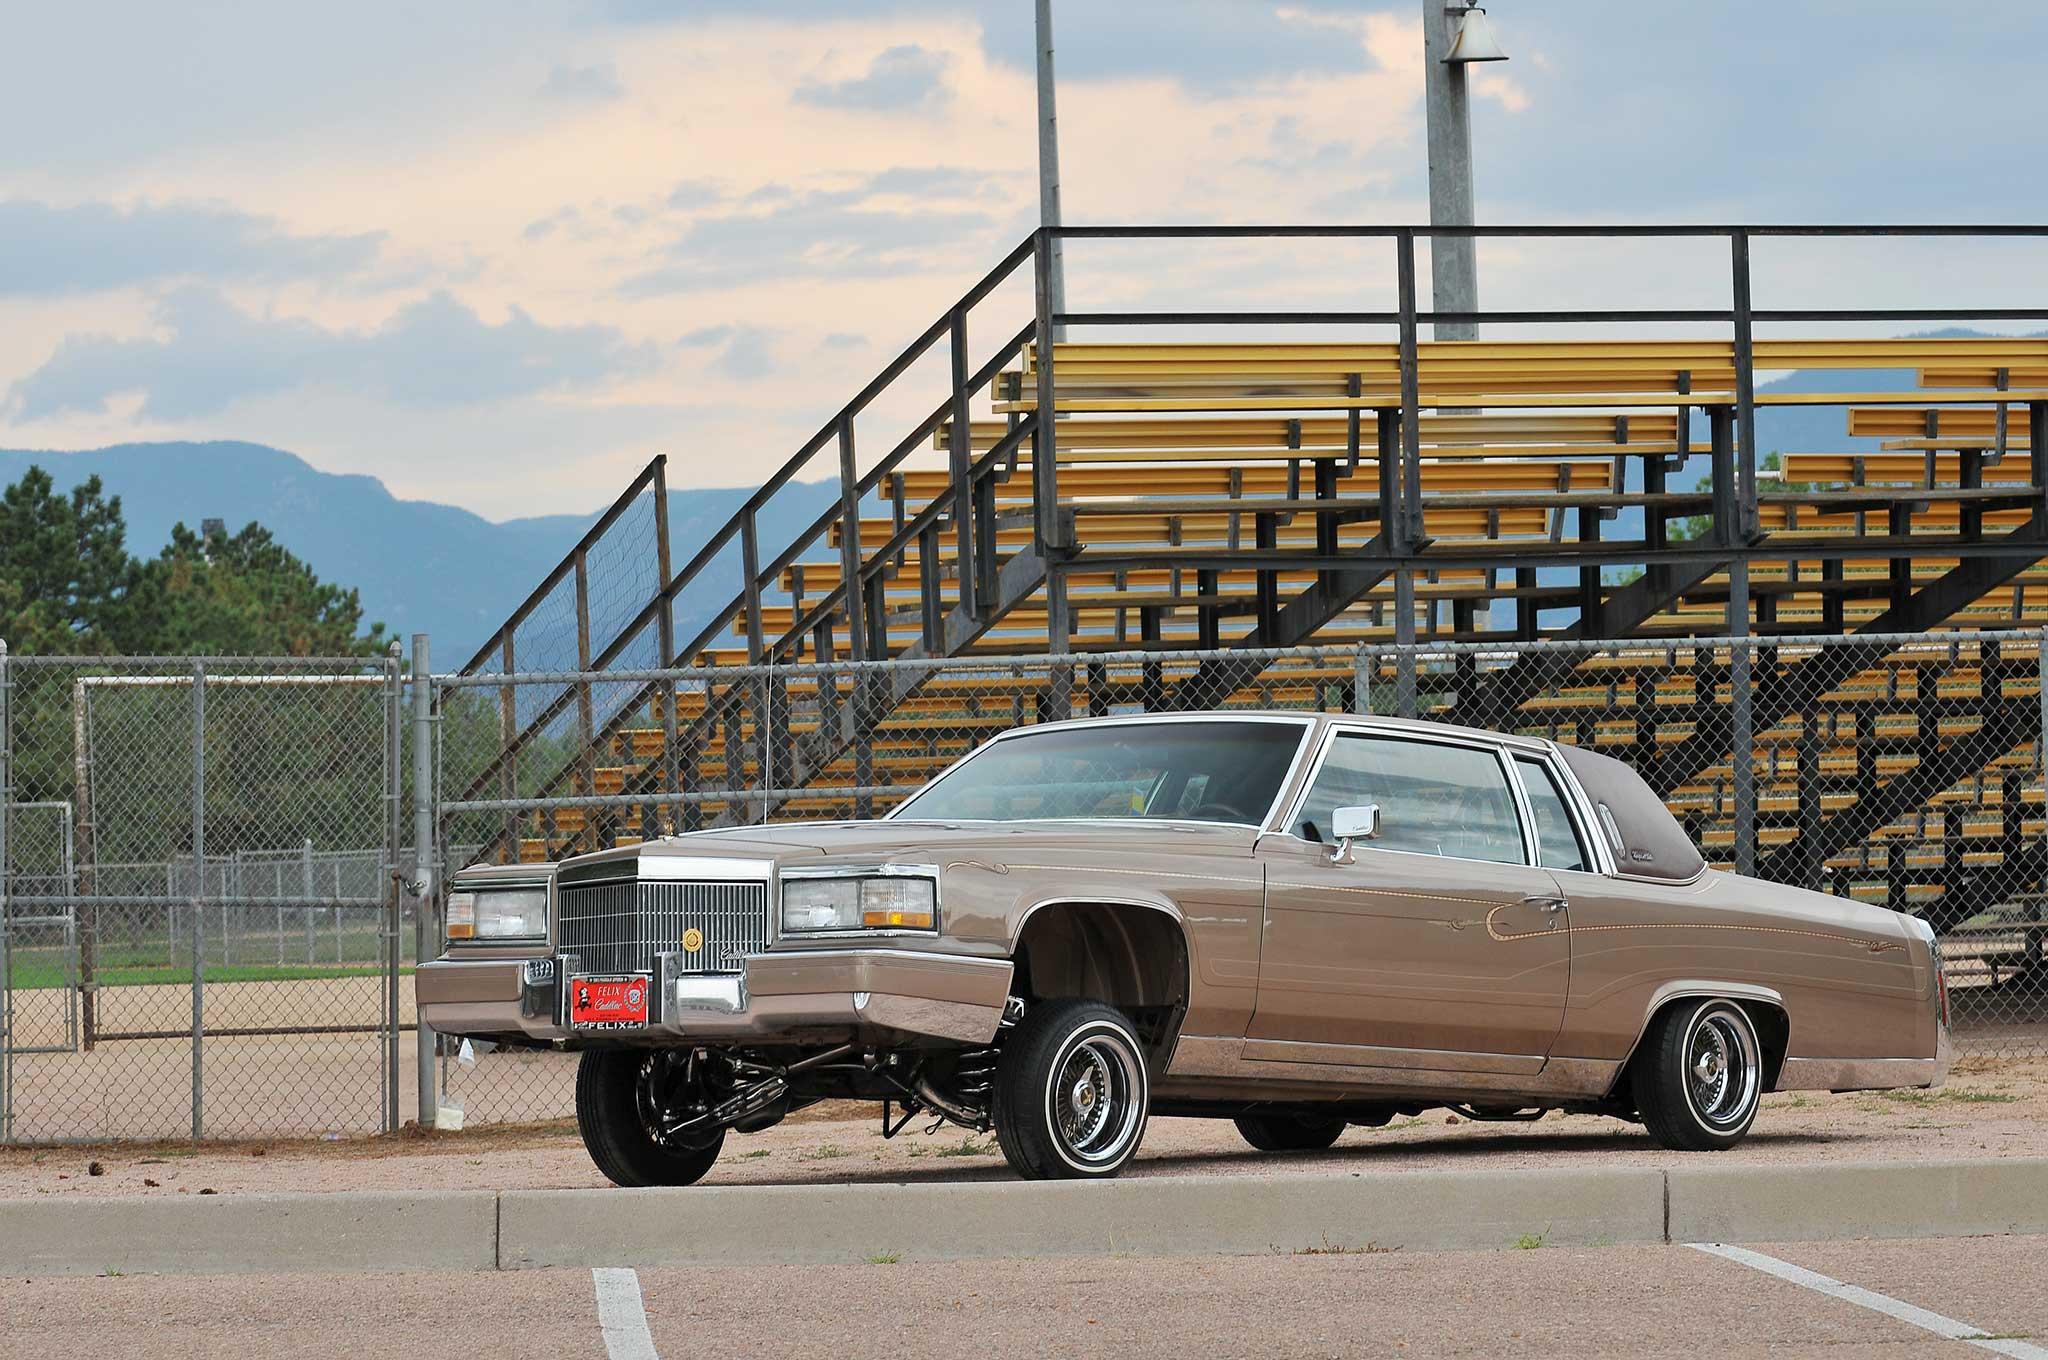 1982 Cadillac Coupe De Ville Doin His Thing